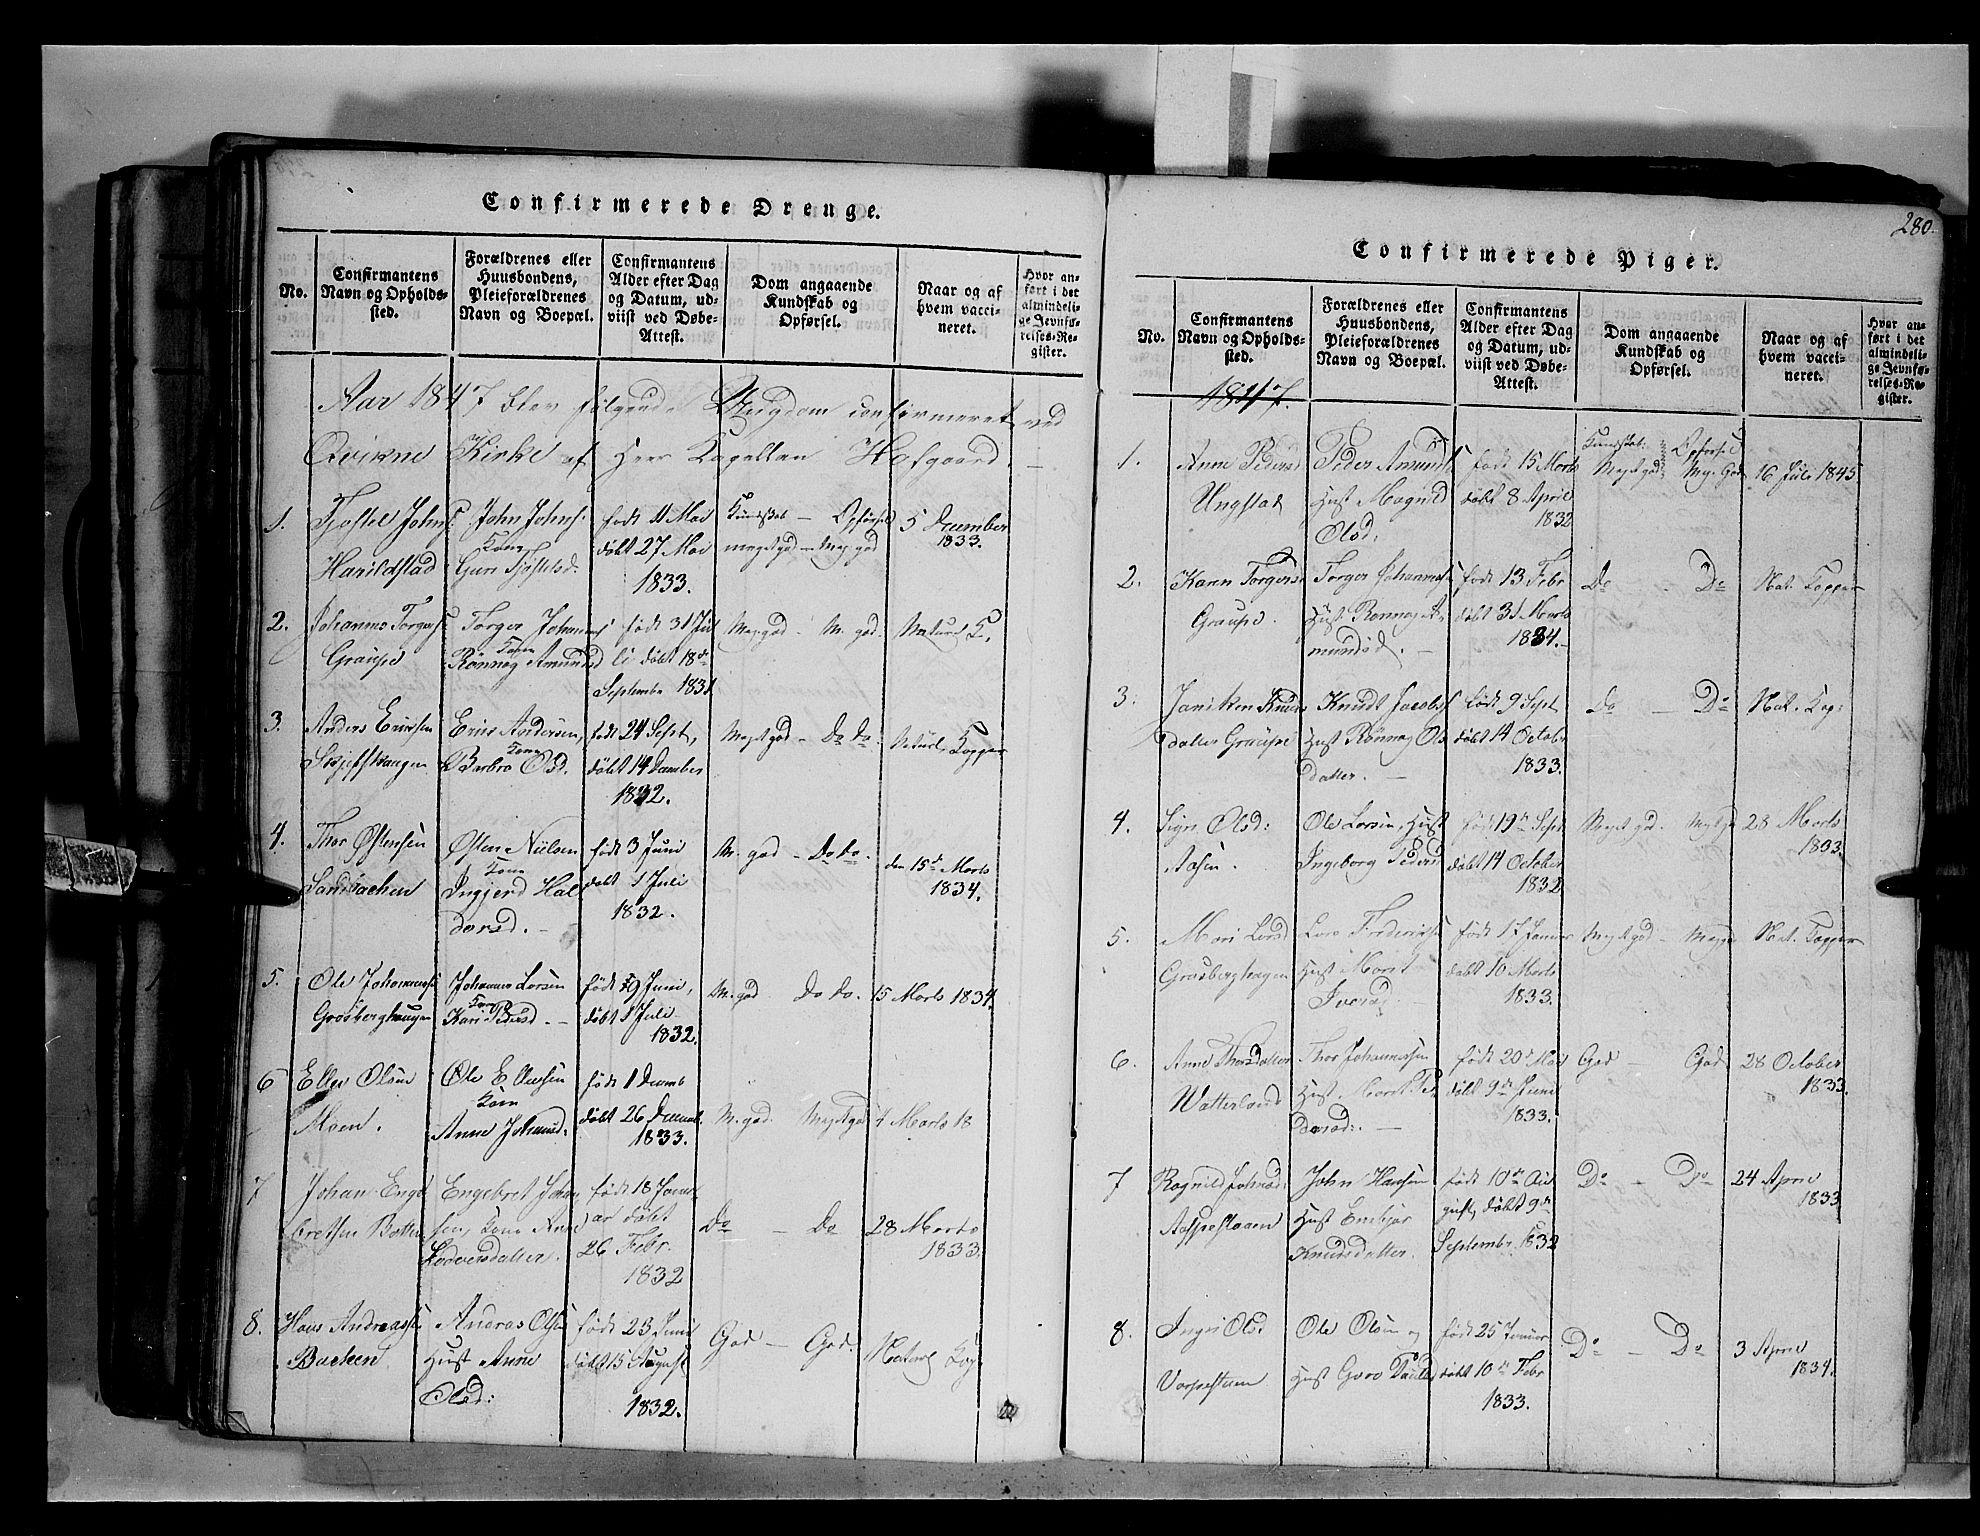 SAH, Fron prestekontor, H/Ha/Hab/L0003: Klokkerbok nr. 3, 1816-1850, s. 280